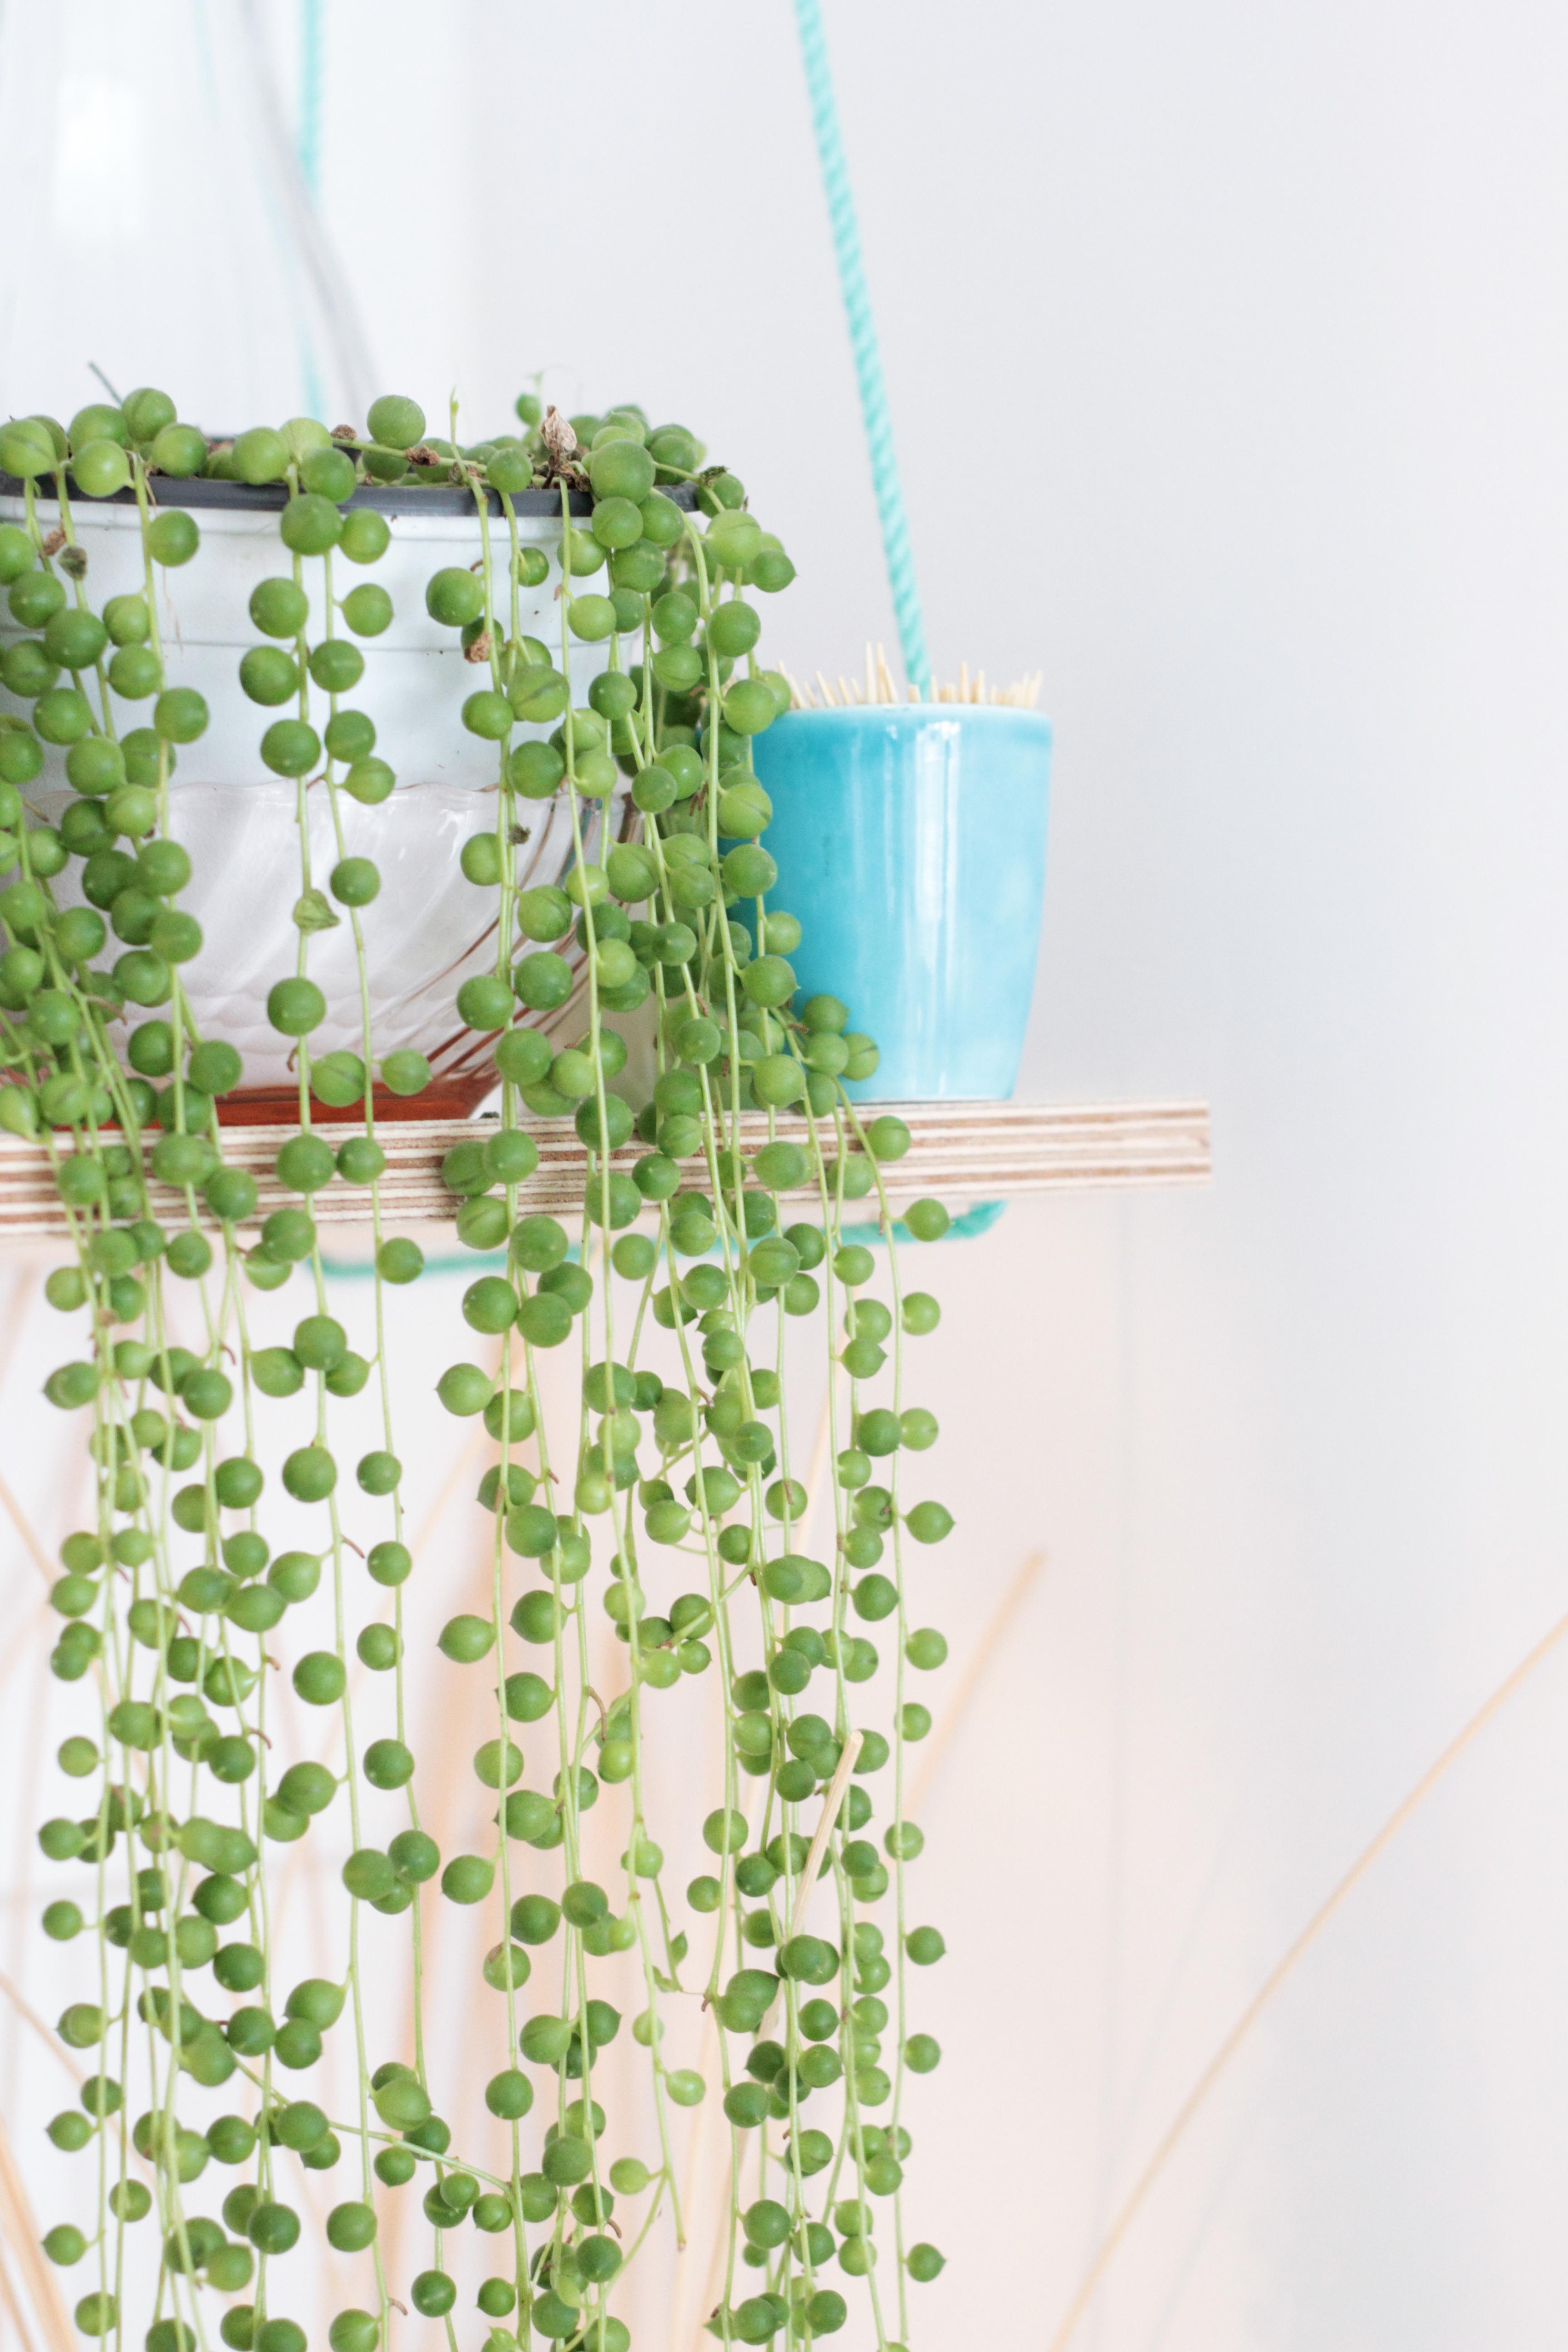 plante grasse qui retombe